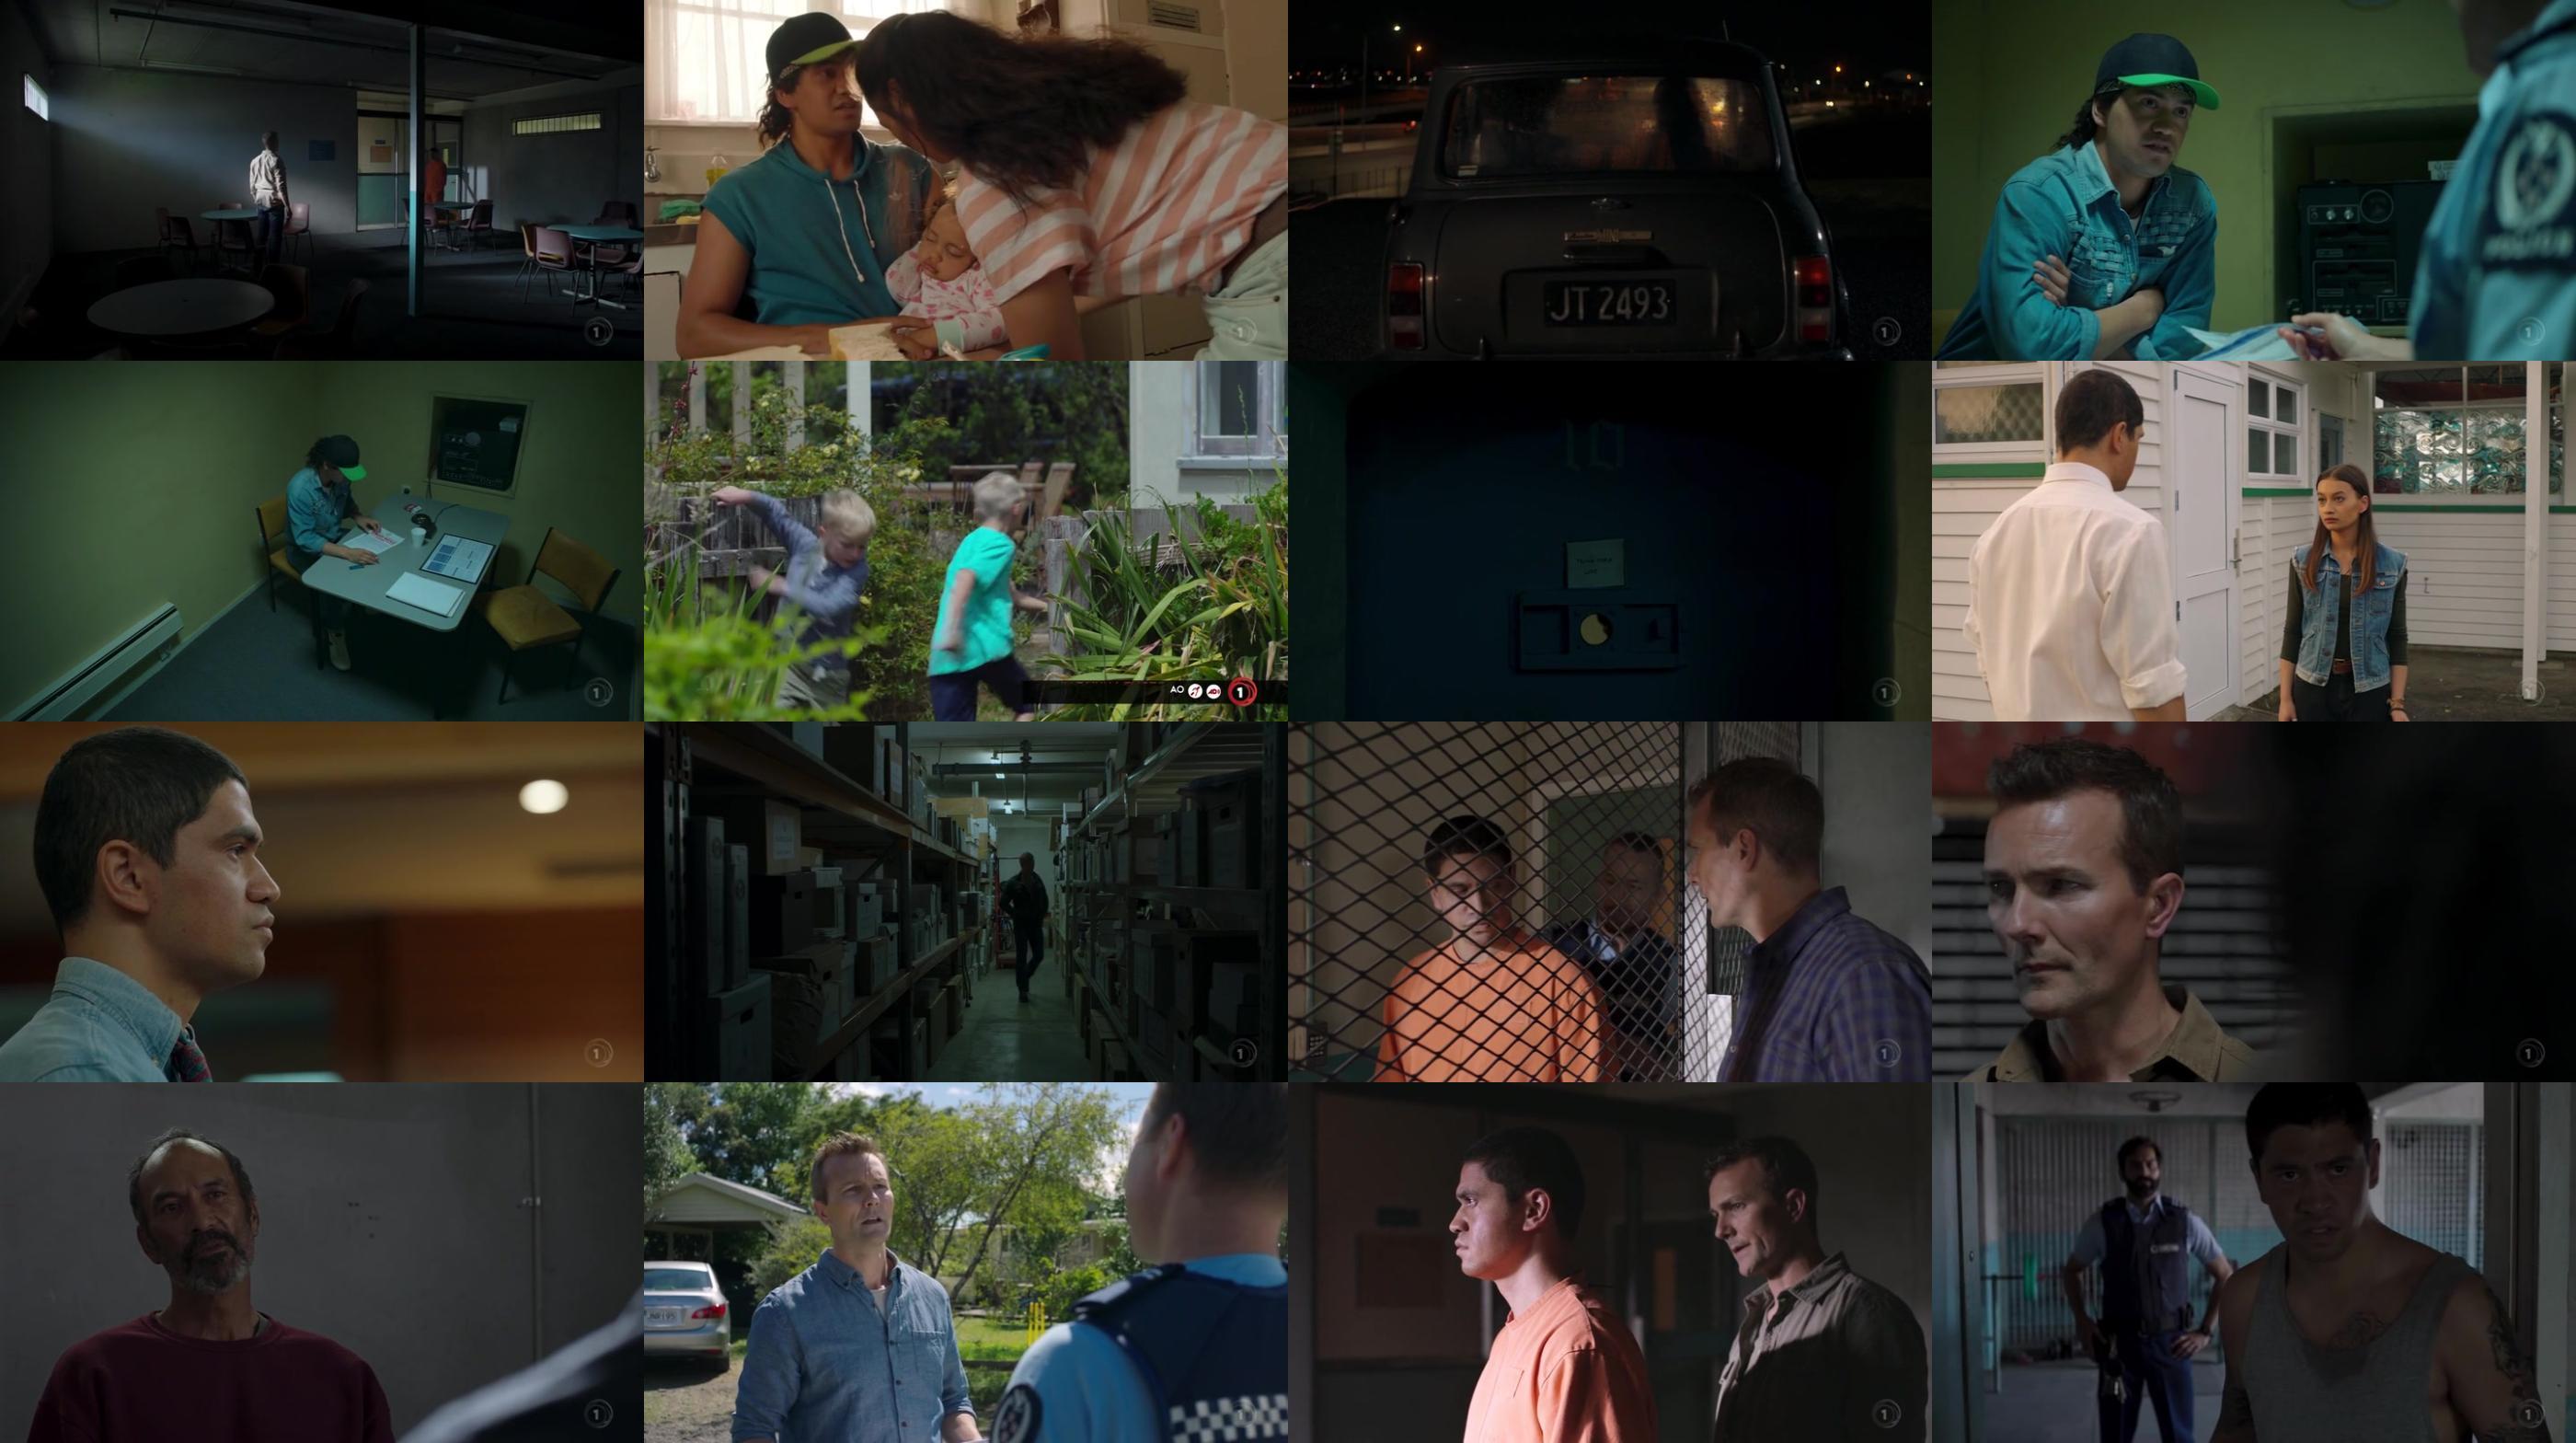 In Dark Places 2019 HDTV x264 FiHTV